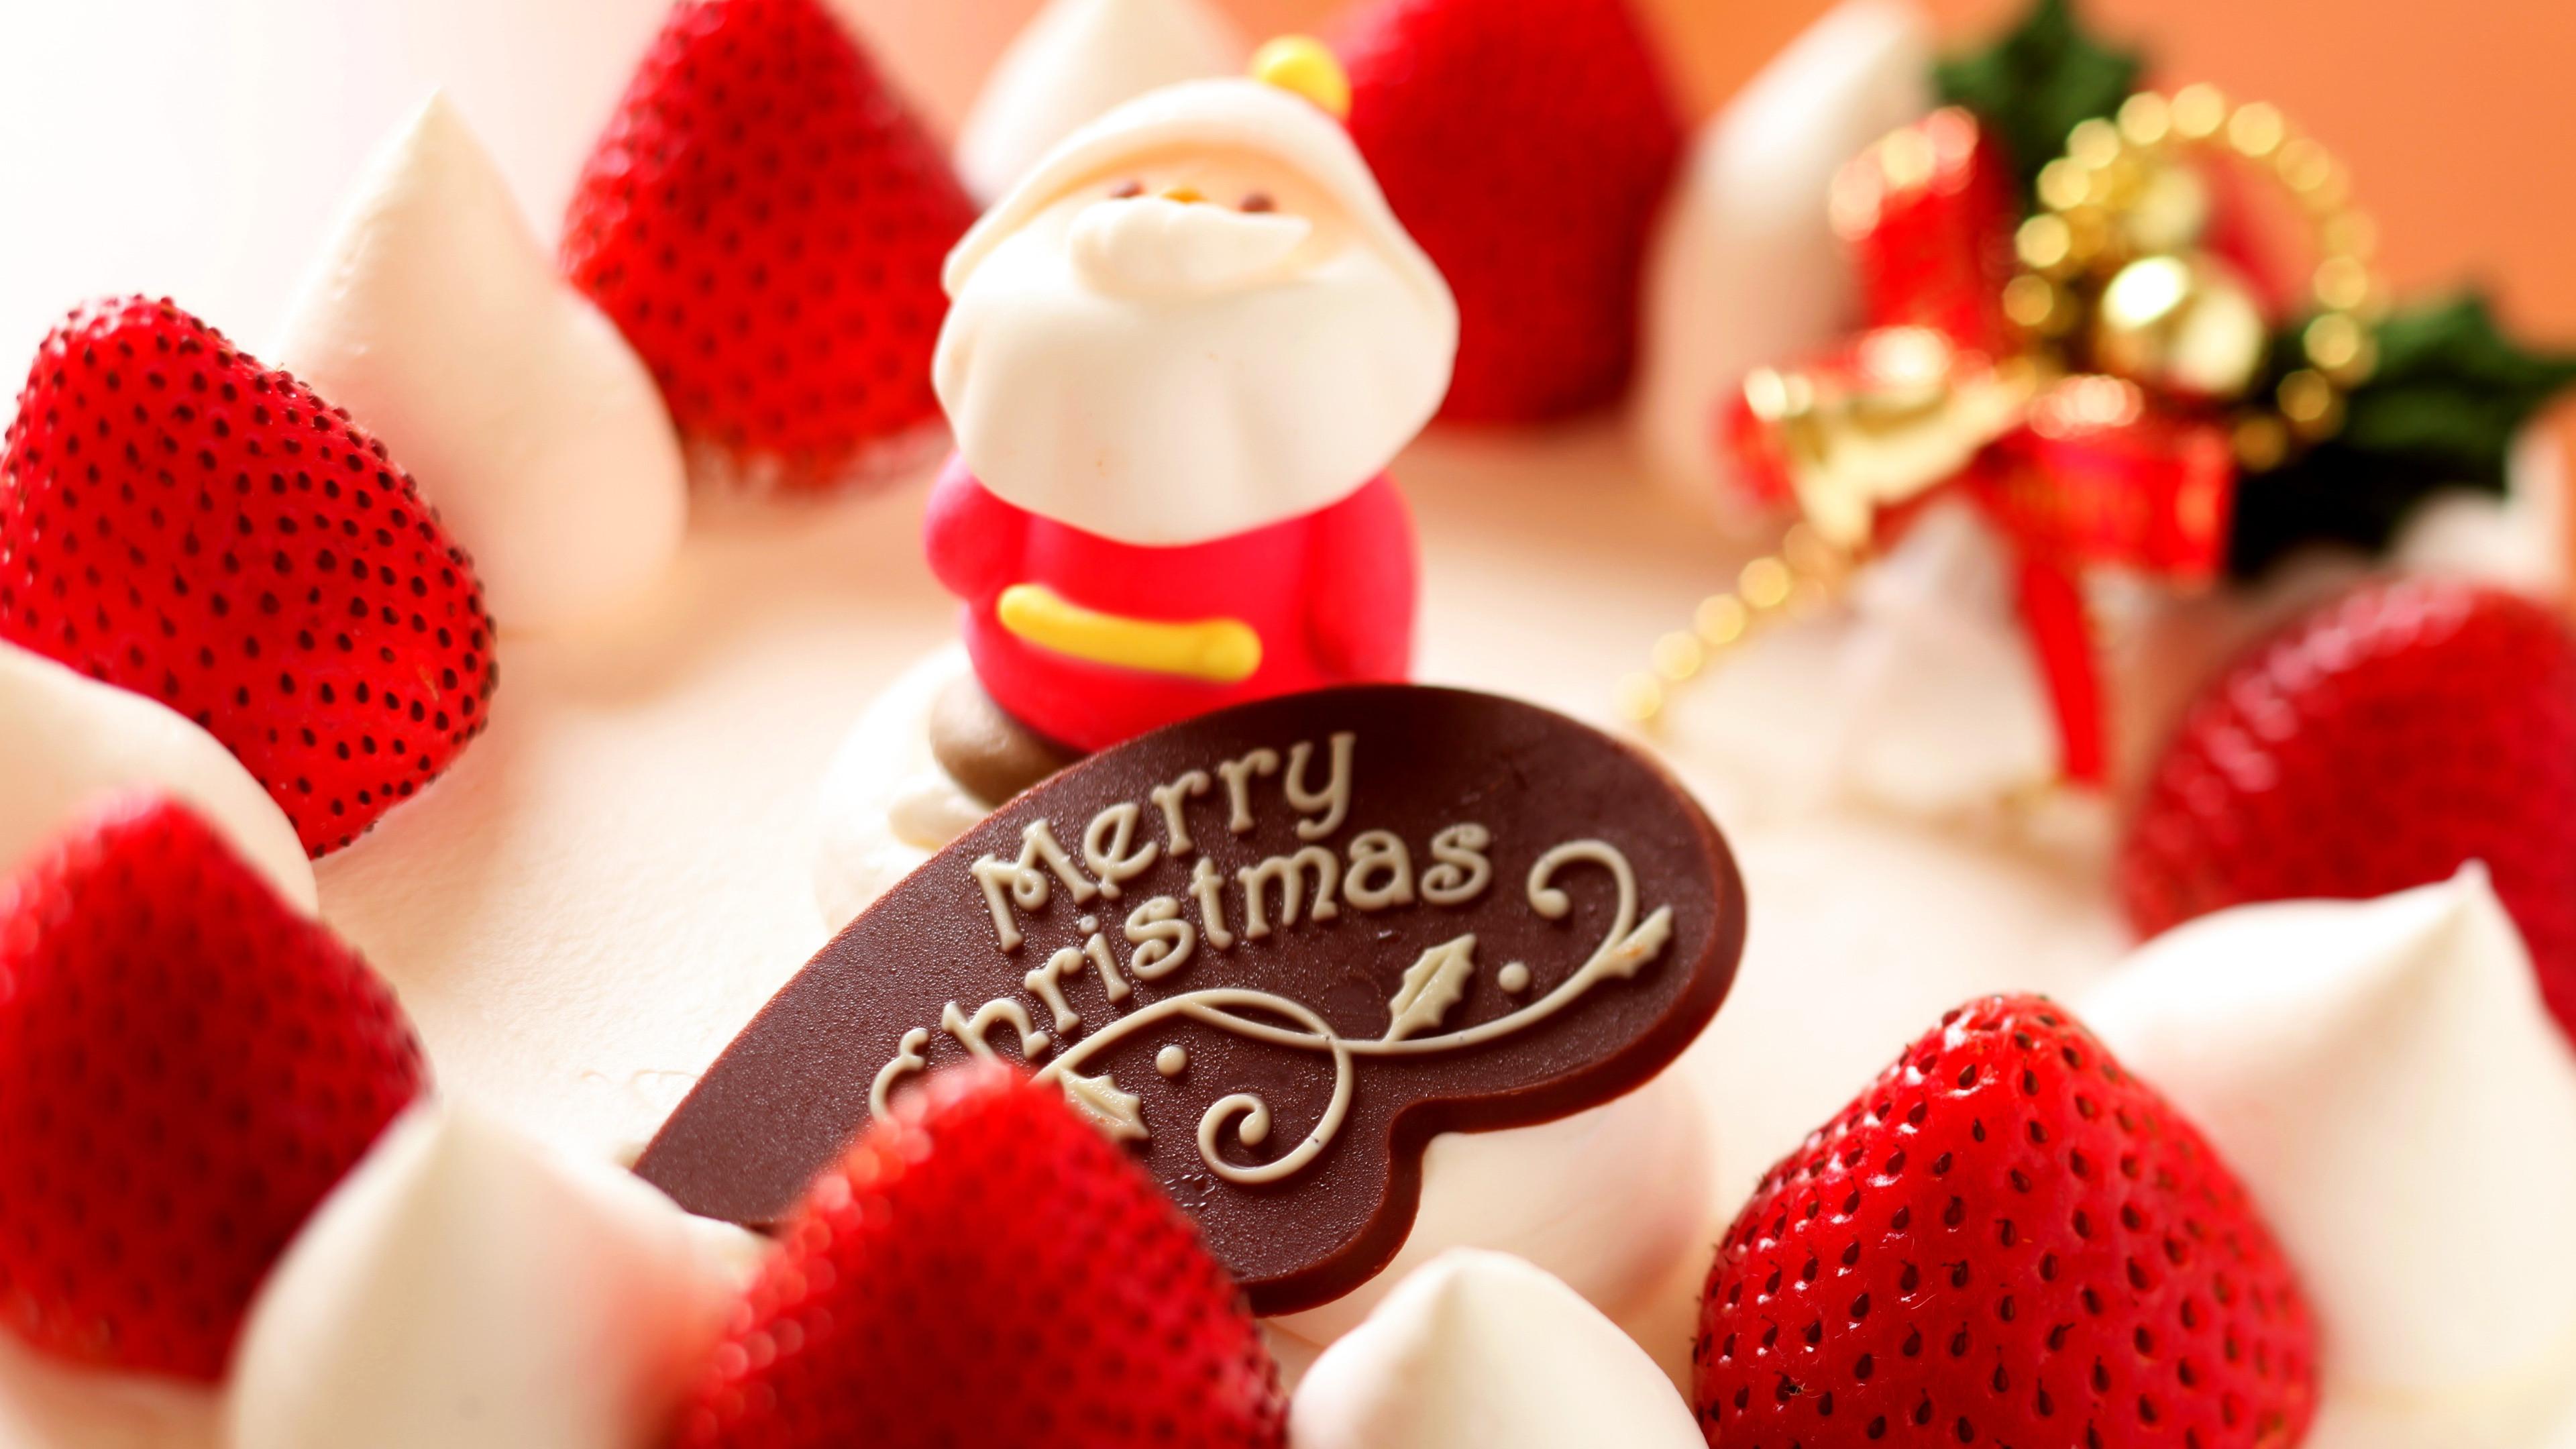 Merry Christmas, Strawberry dessert, Santa Claus, 4K